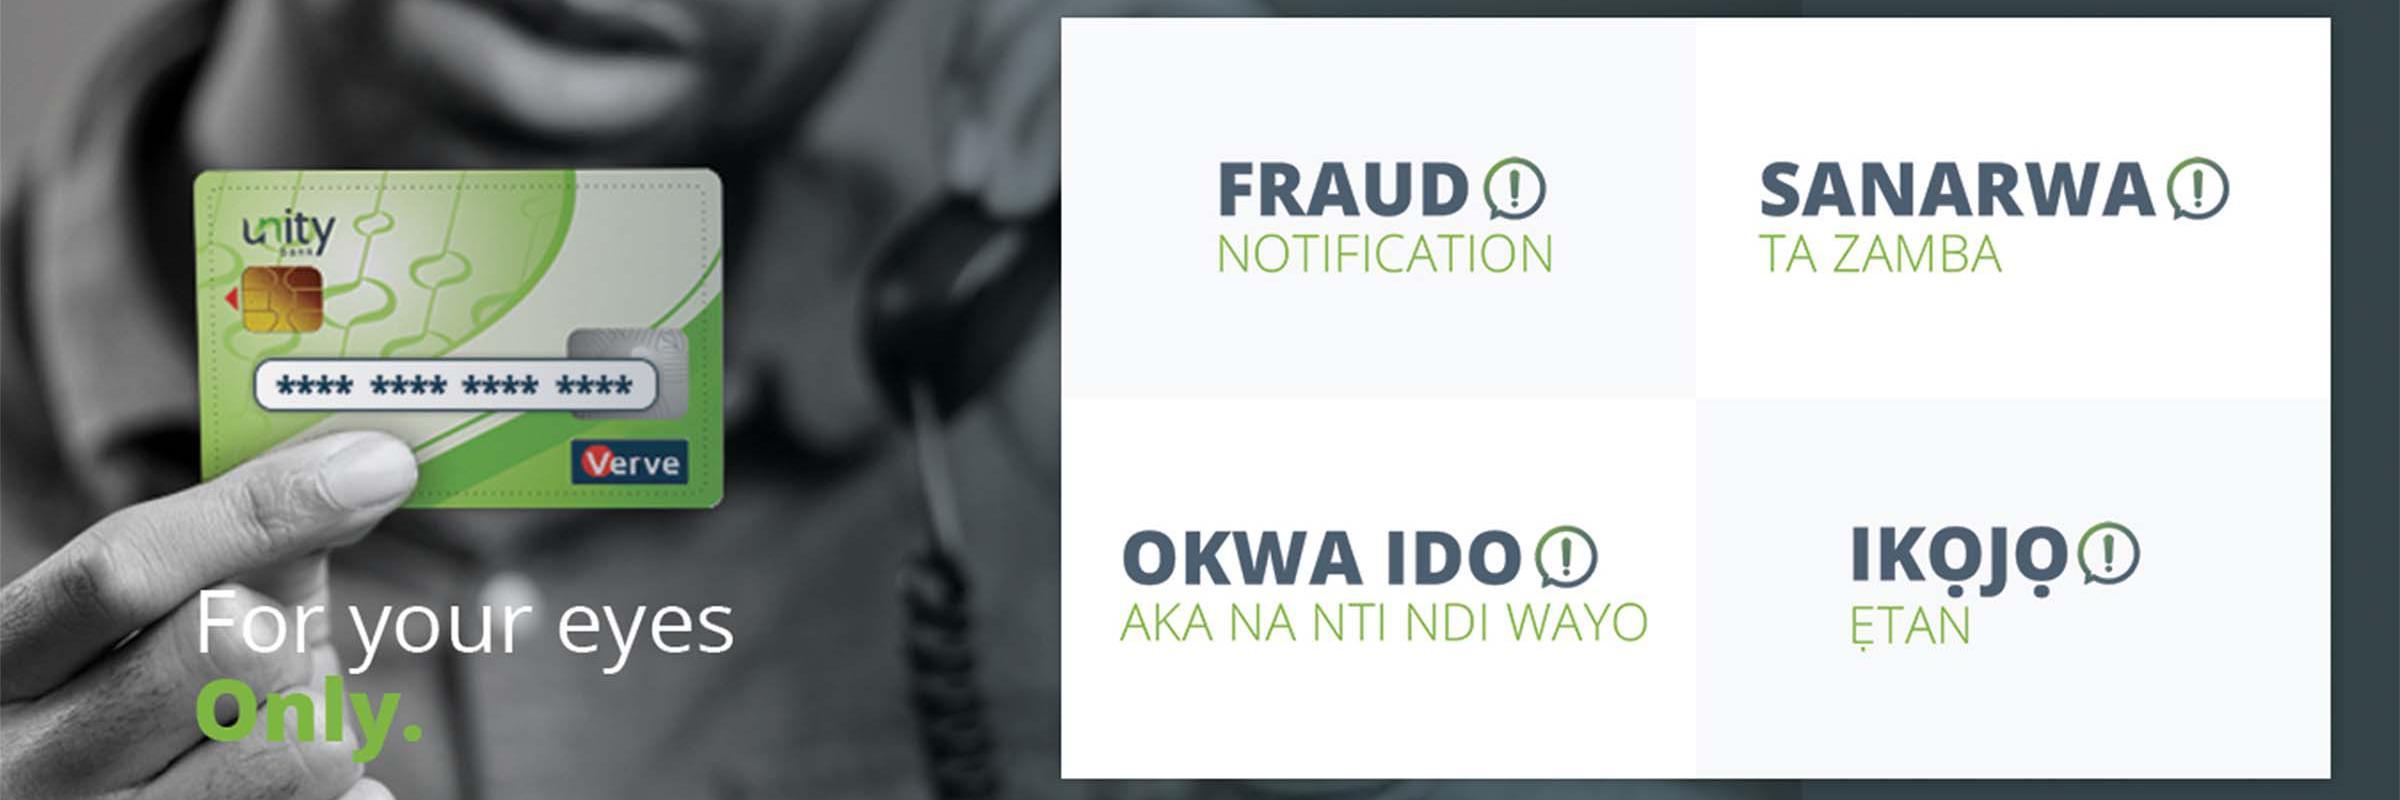 Fraud Notification